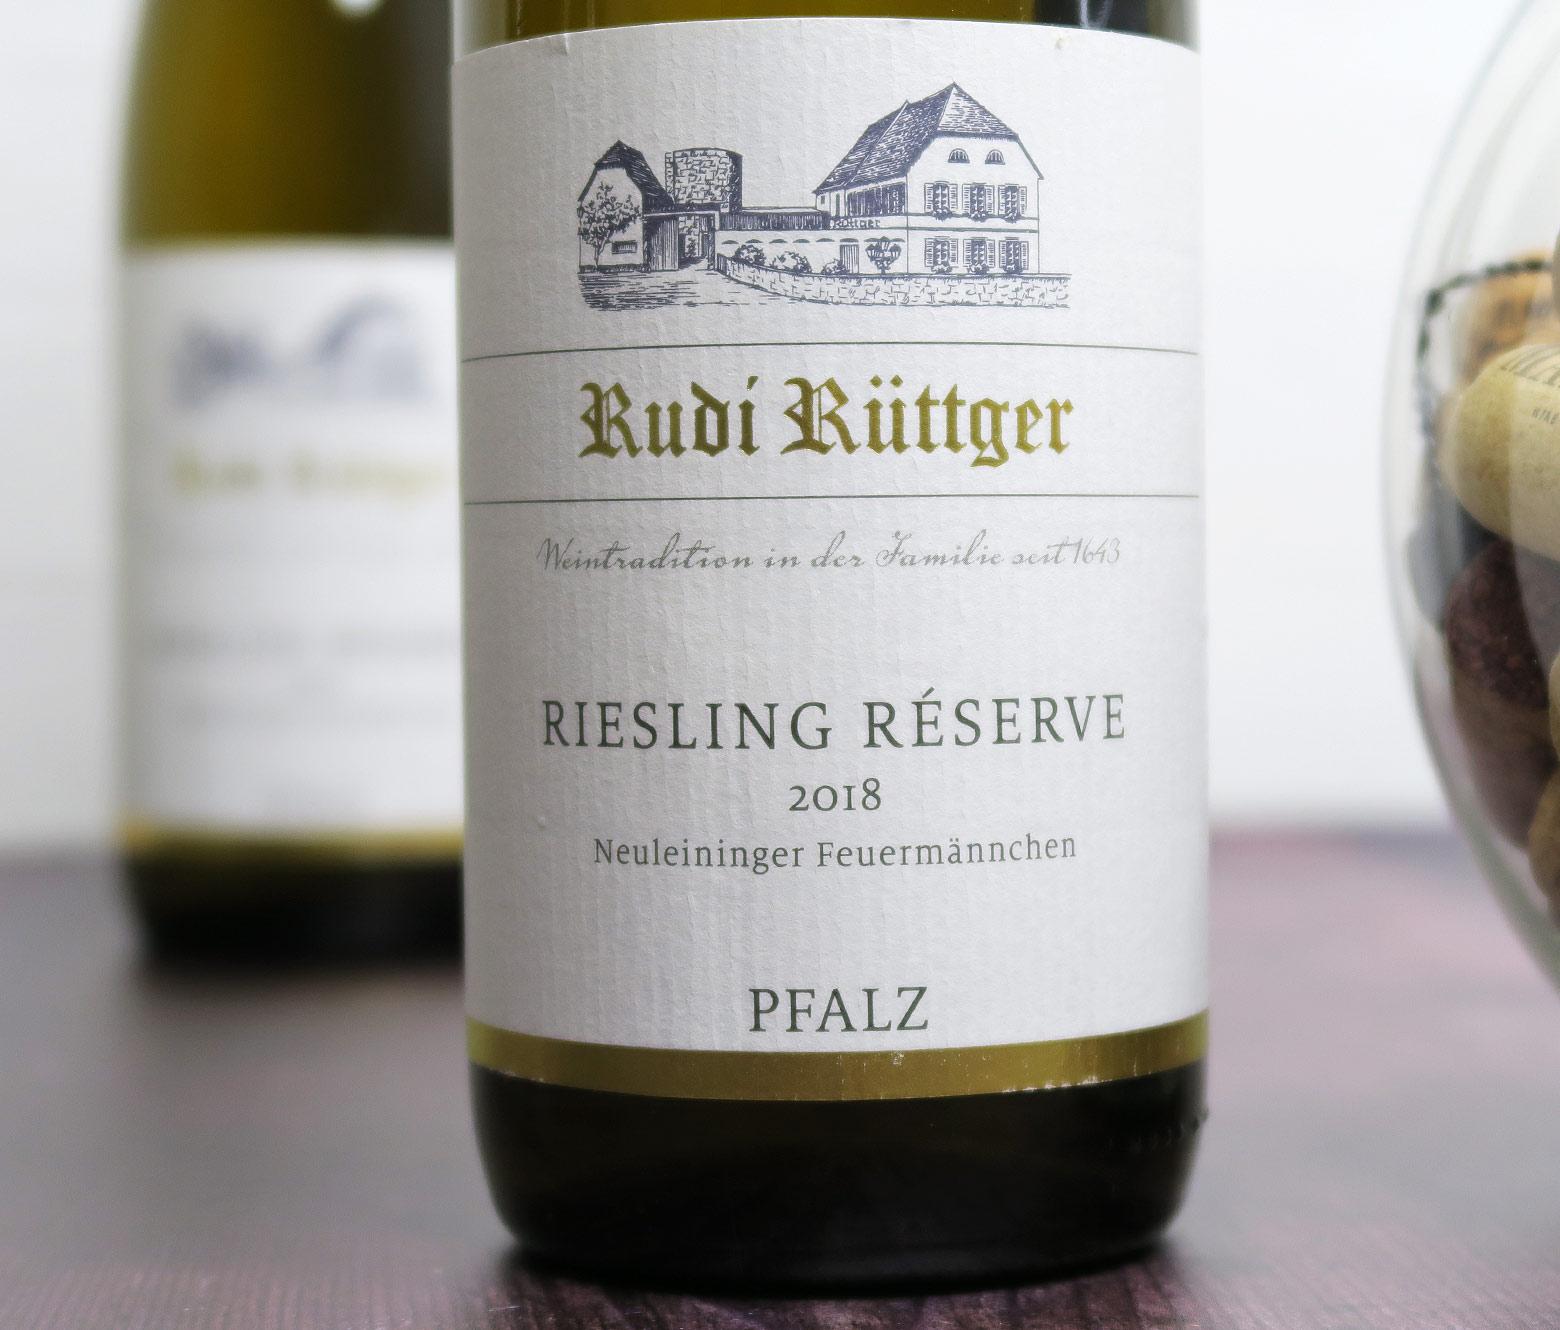 Rudi Rüttger Riesling Réserve trocken 2018